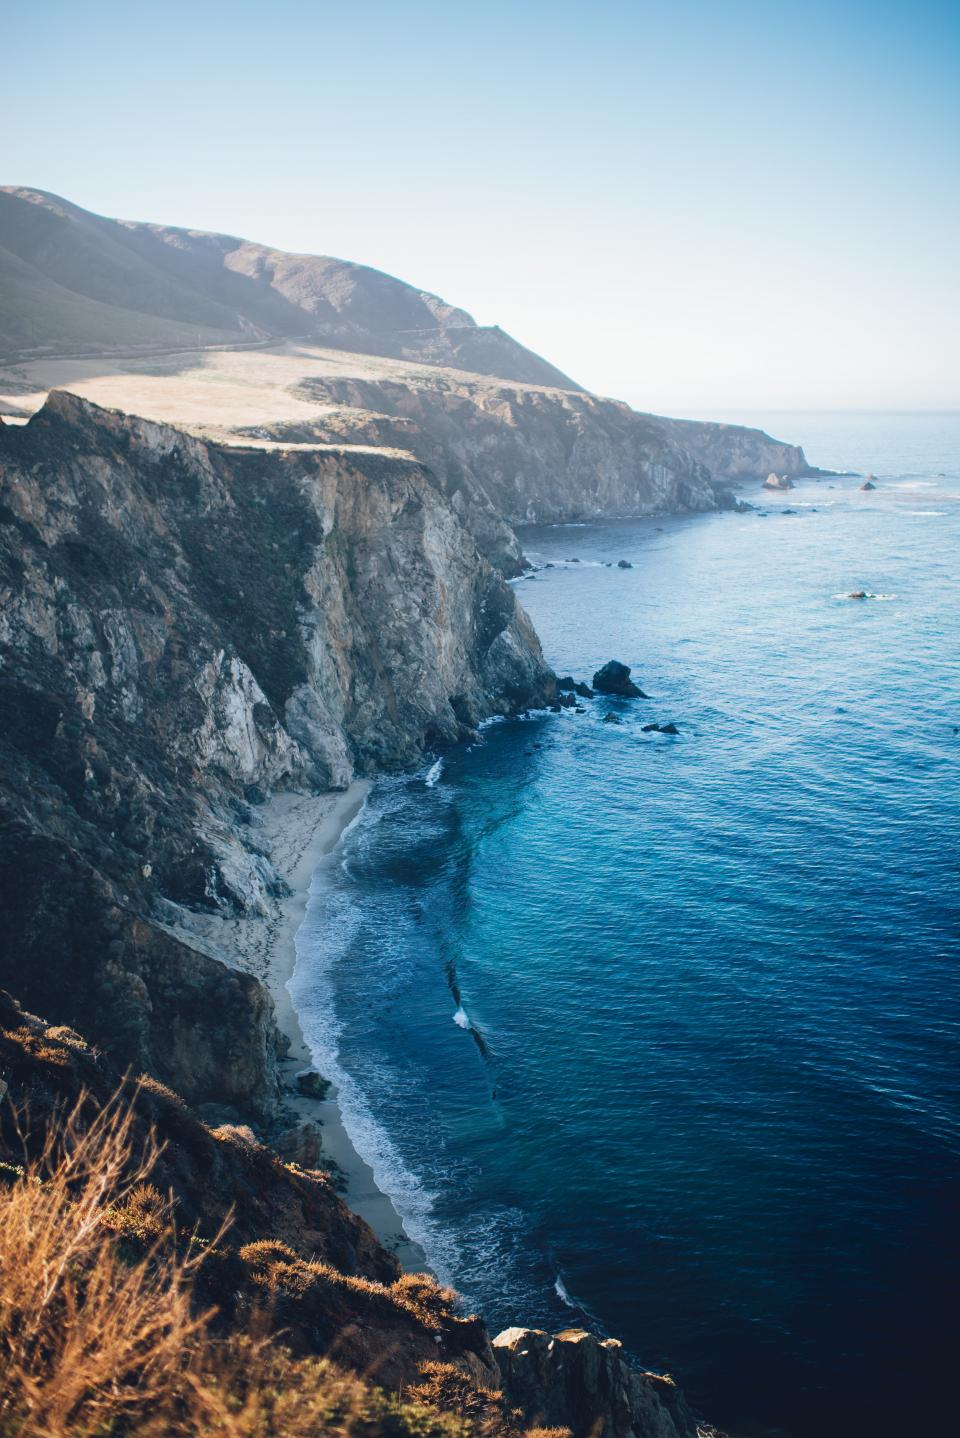 nature, landscape, mountain, coast, beach, shore, sea, waves, water, blue, rocks, sky, horizon